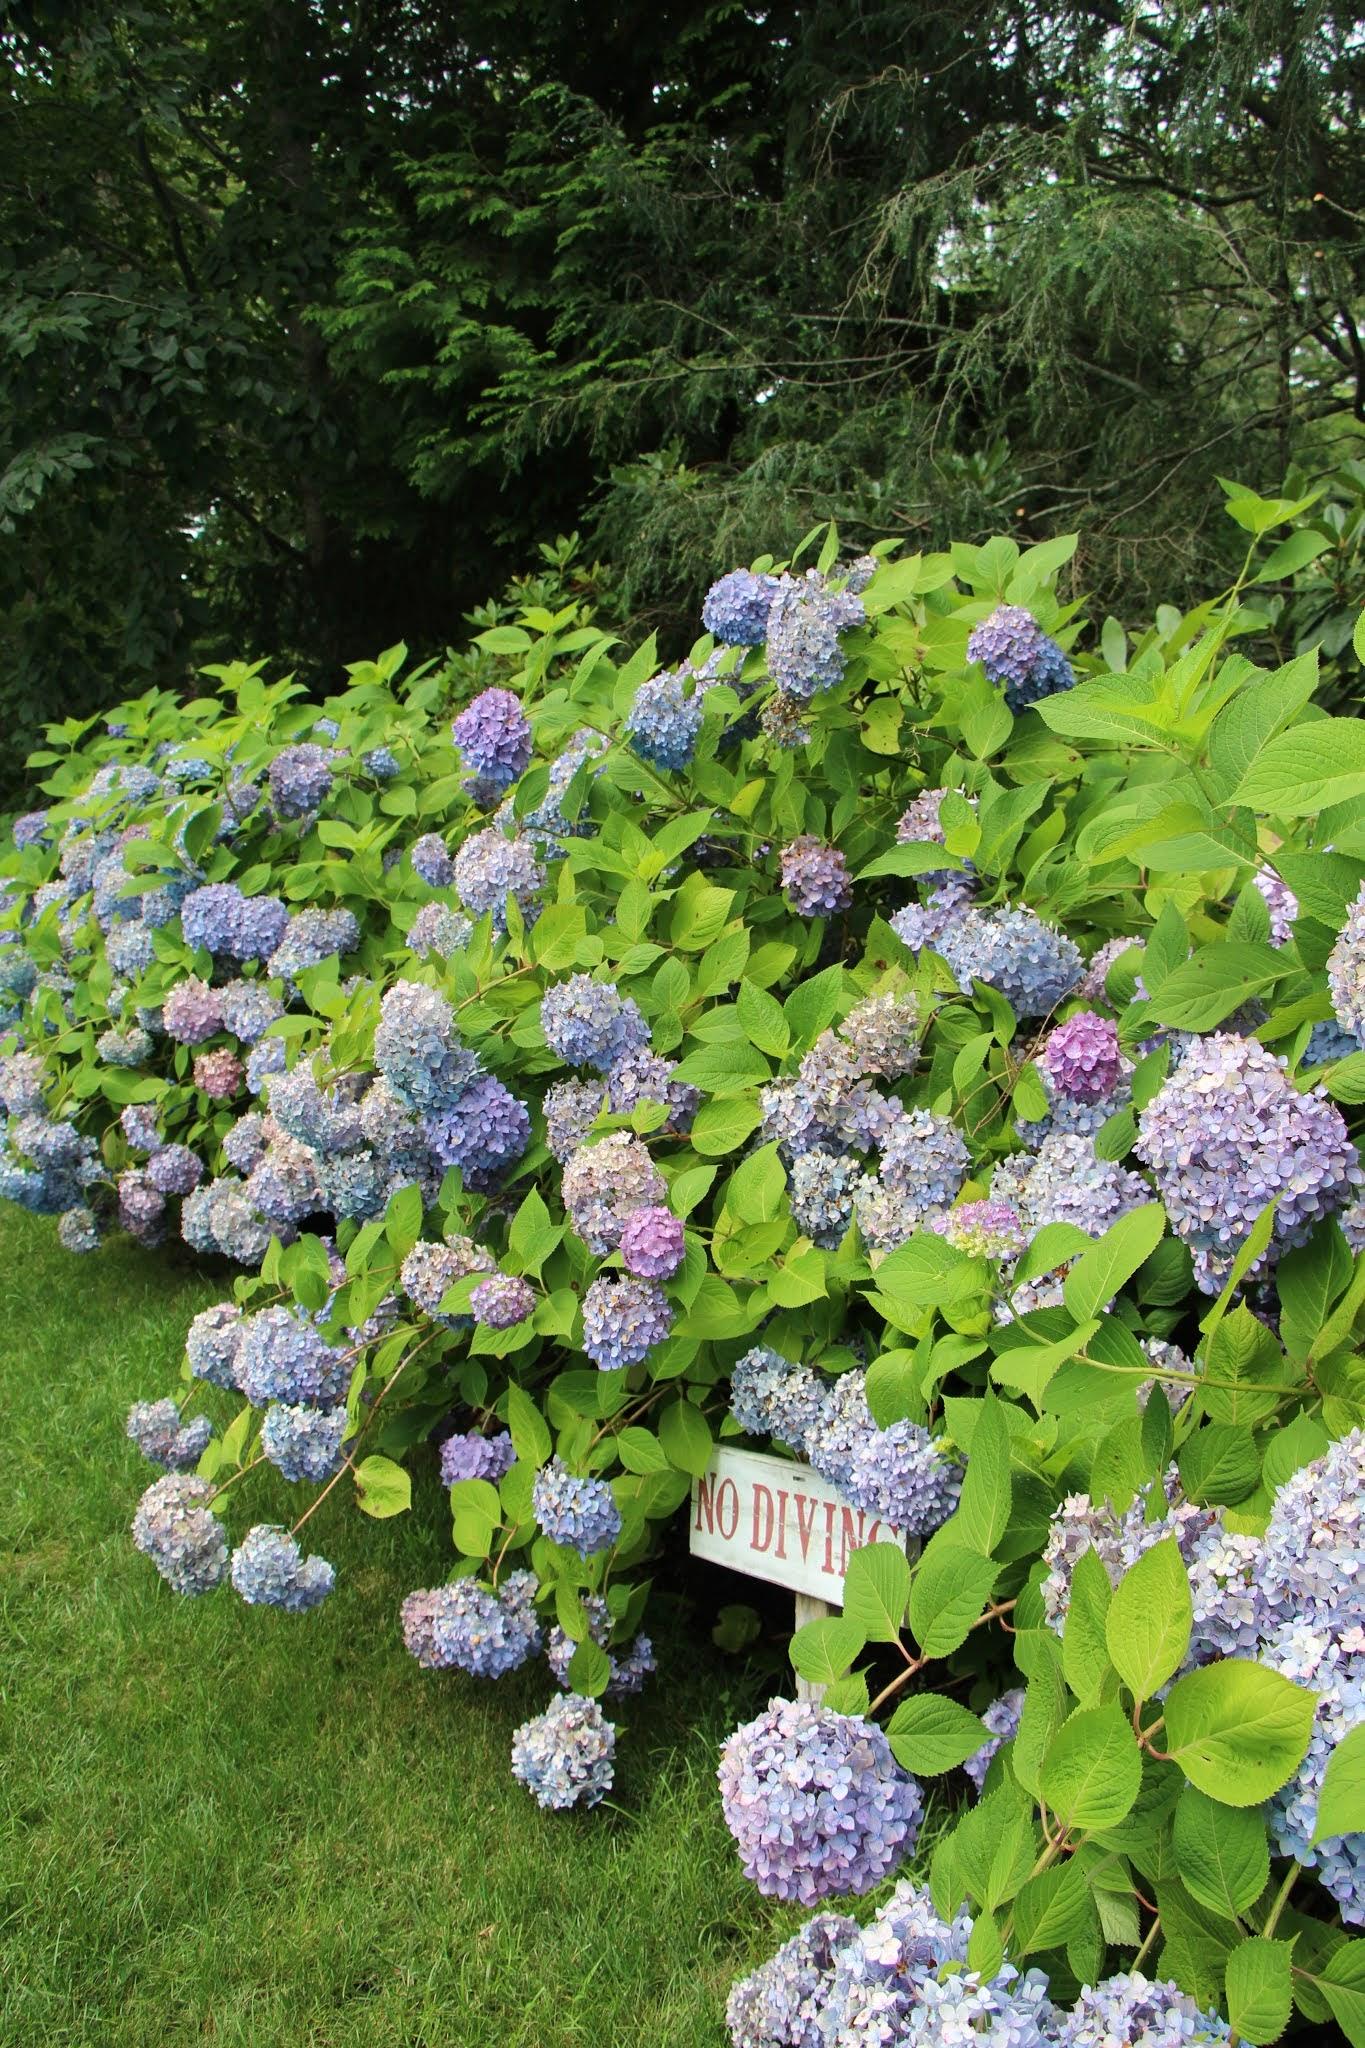 hydrangeas, hamptons, east hampton, long island, summer, flowers, travel guide